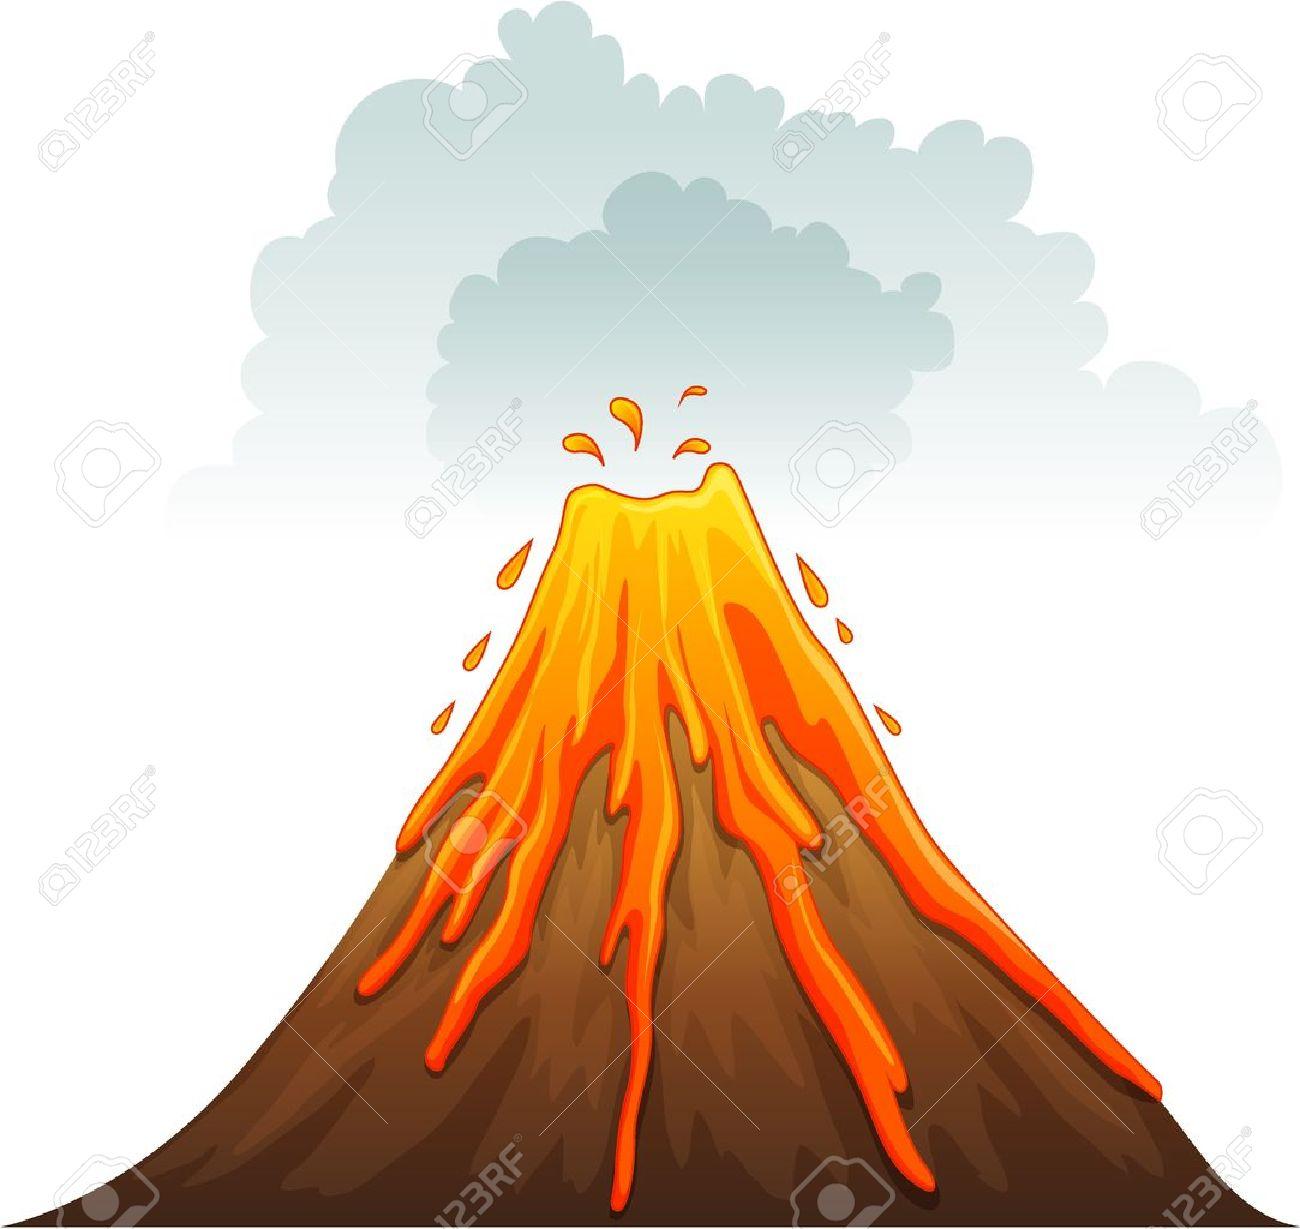 volcano: Illustration of a